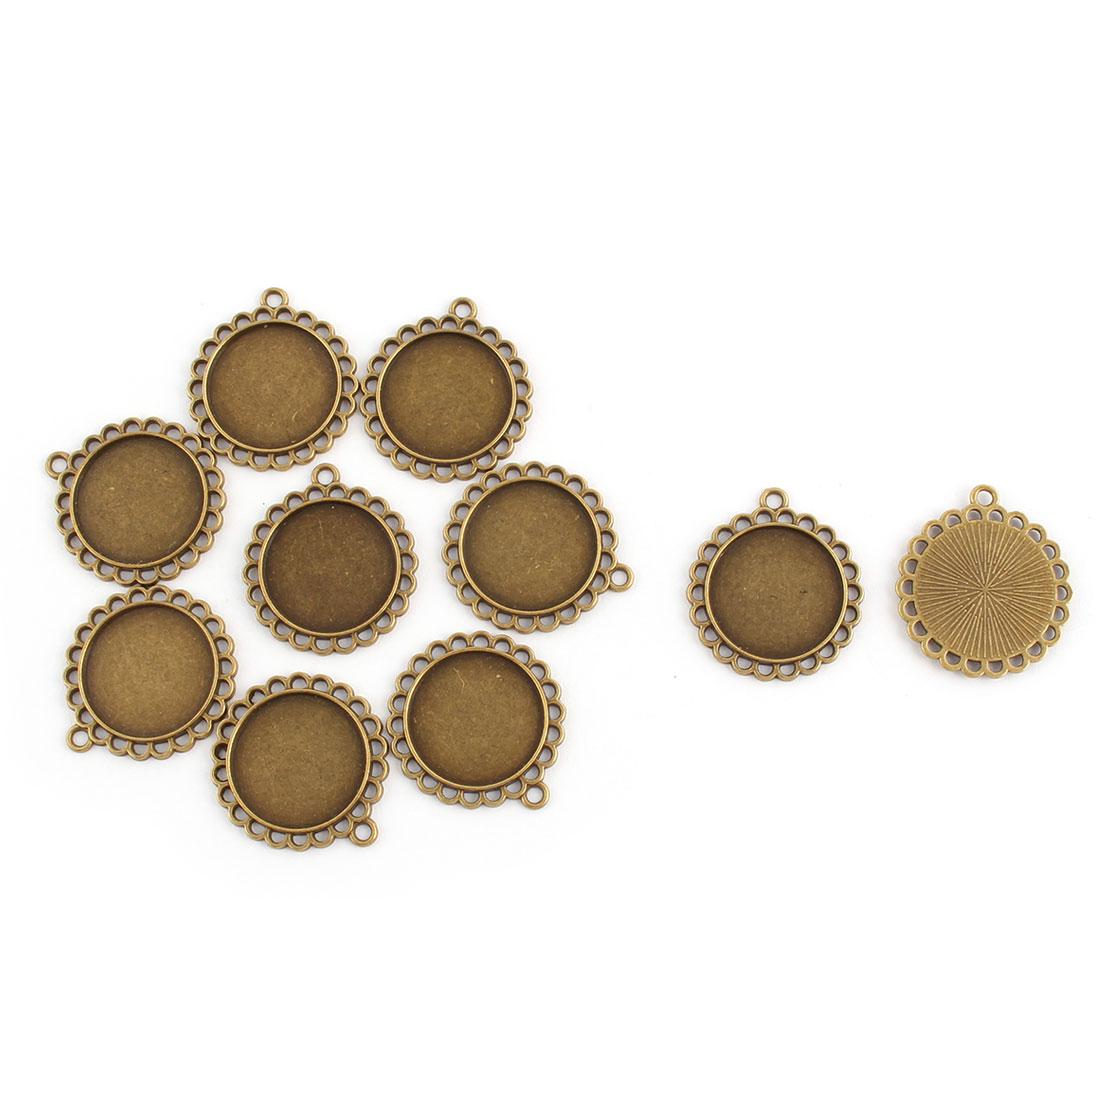 Jewelry Copper Alloy Decoration Vintage Style Pendant Trays Bronze Tone 20mm Inner Dia 10pcs